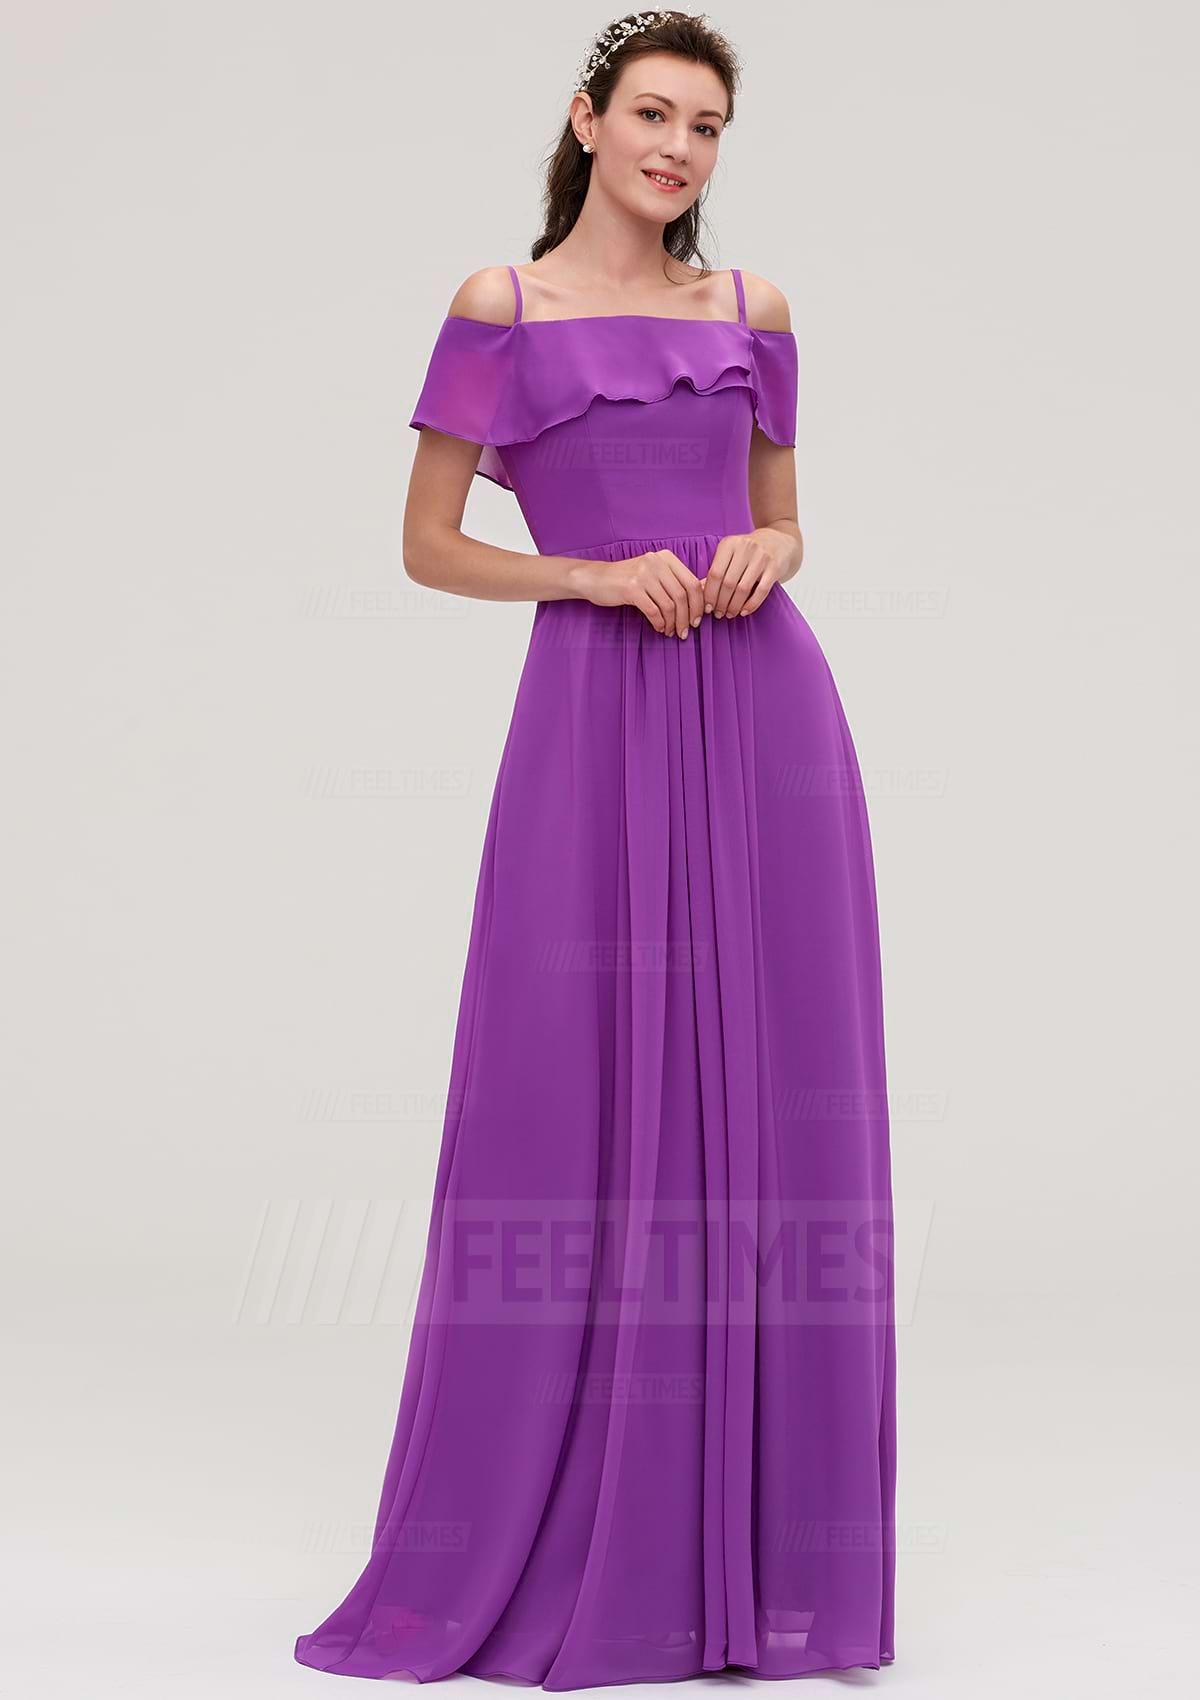 A-Line/Princess Off-The-Shoulder Sleeveless Long/Floor-Length Chiffon Bridesmaid Dresses With Ruffles